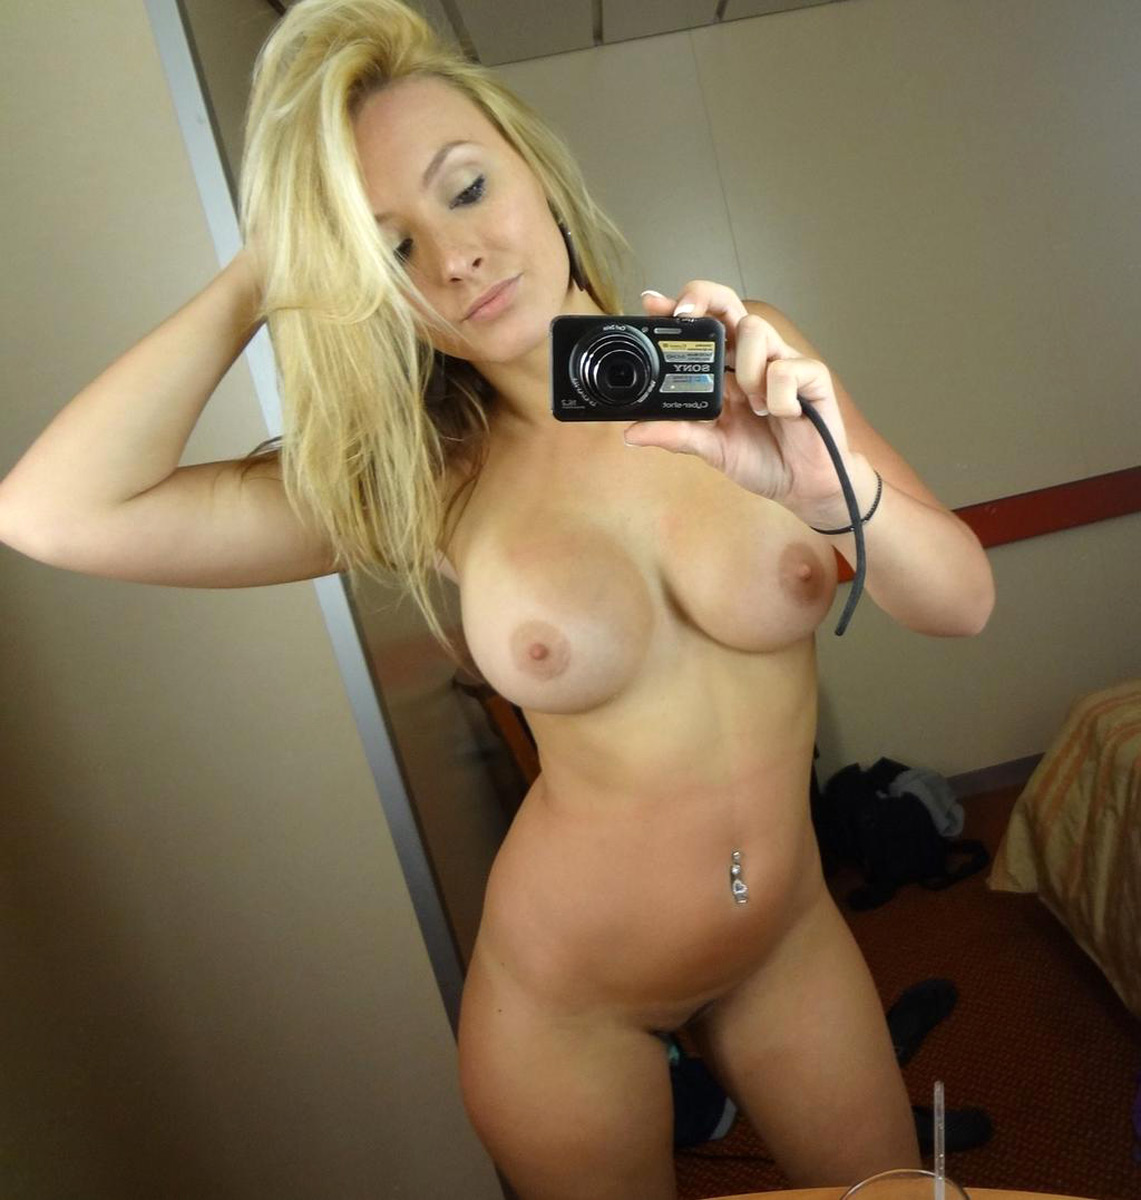 Hot cougar mom lingerie